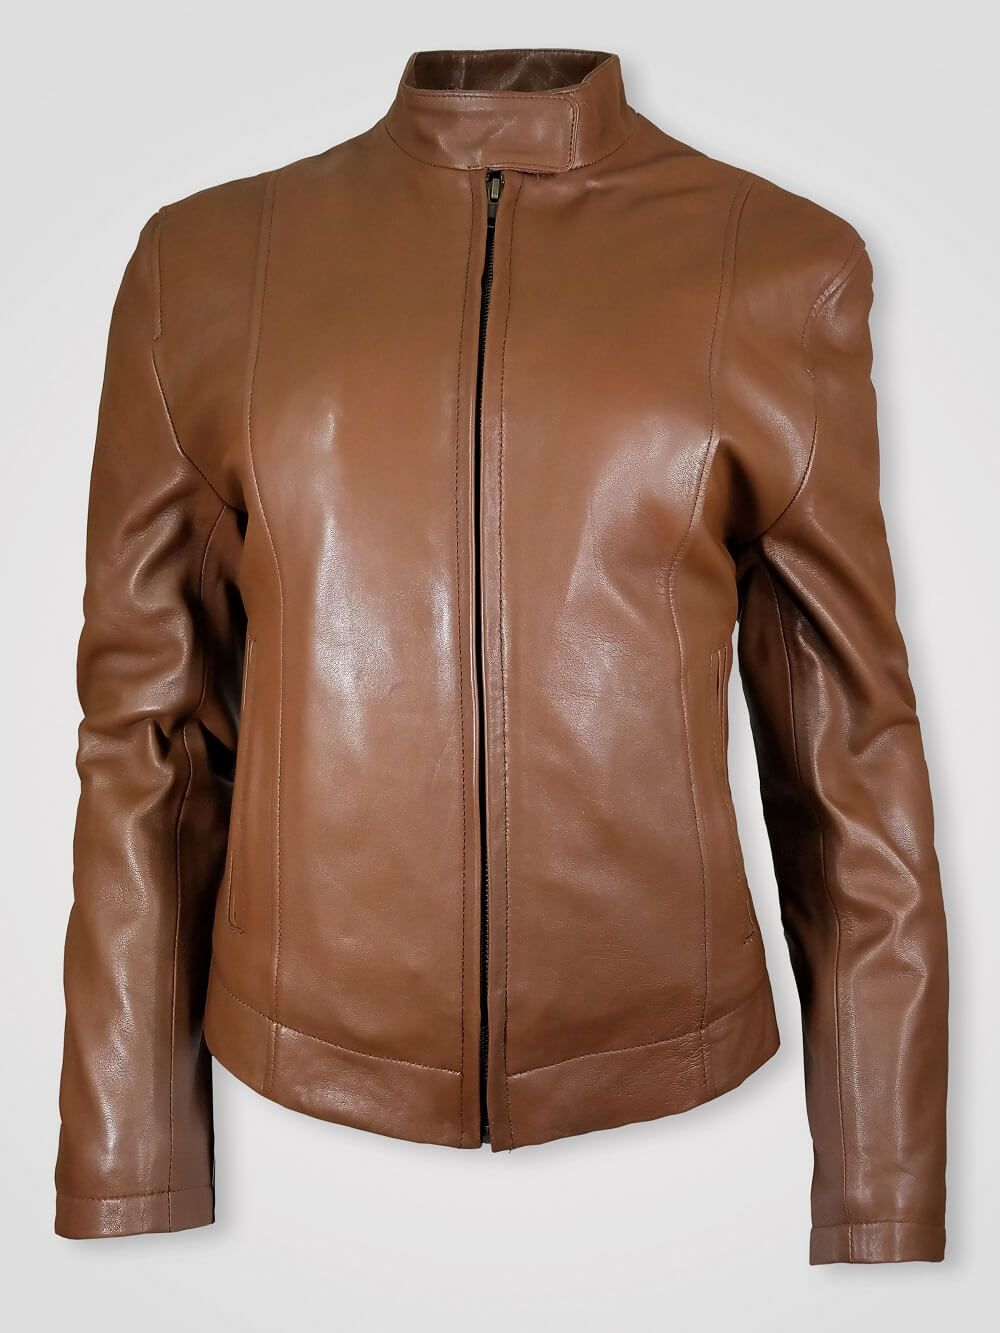 Classic biker jacket for women's with cross pockets in tan